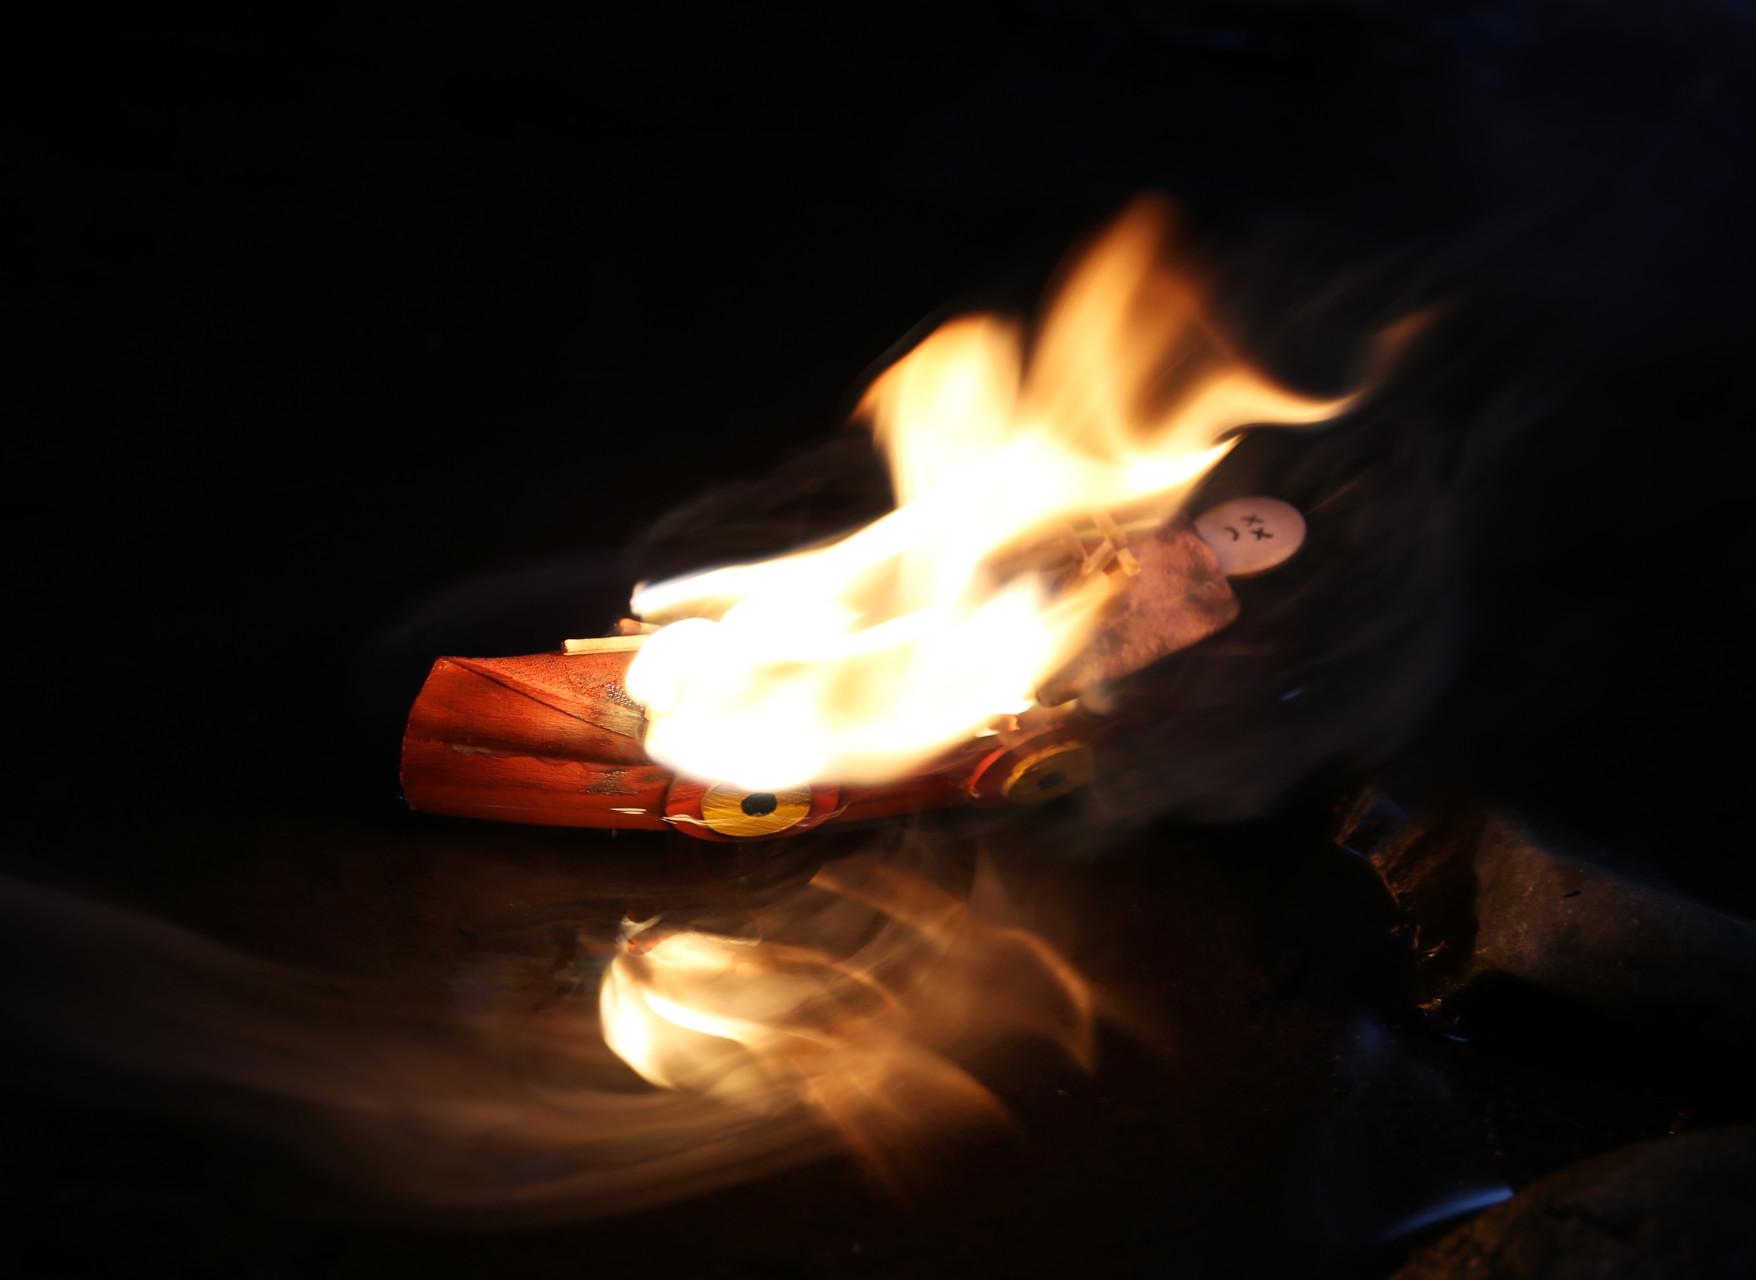 Impressive flames for longer than previous attempts.